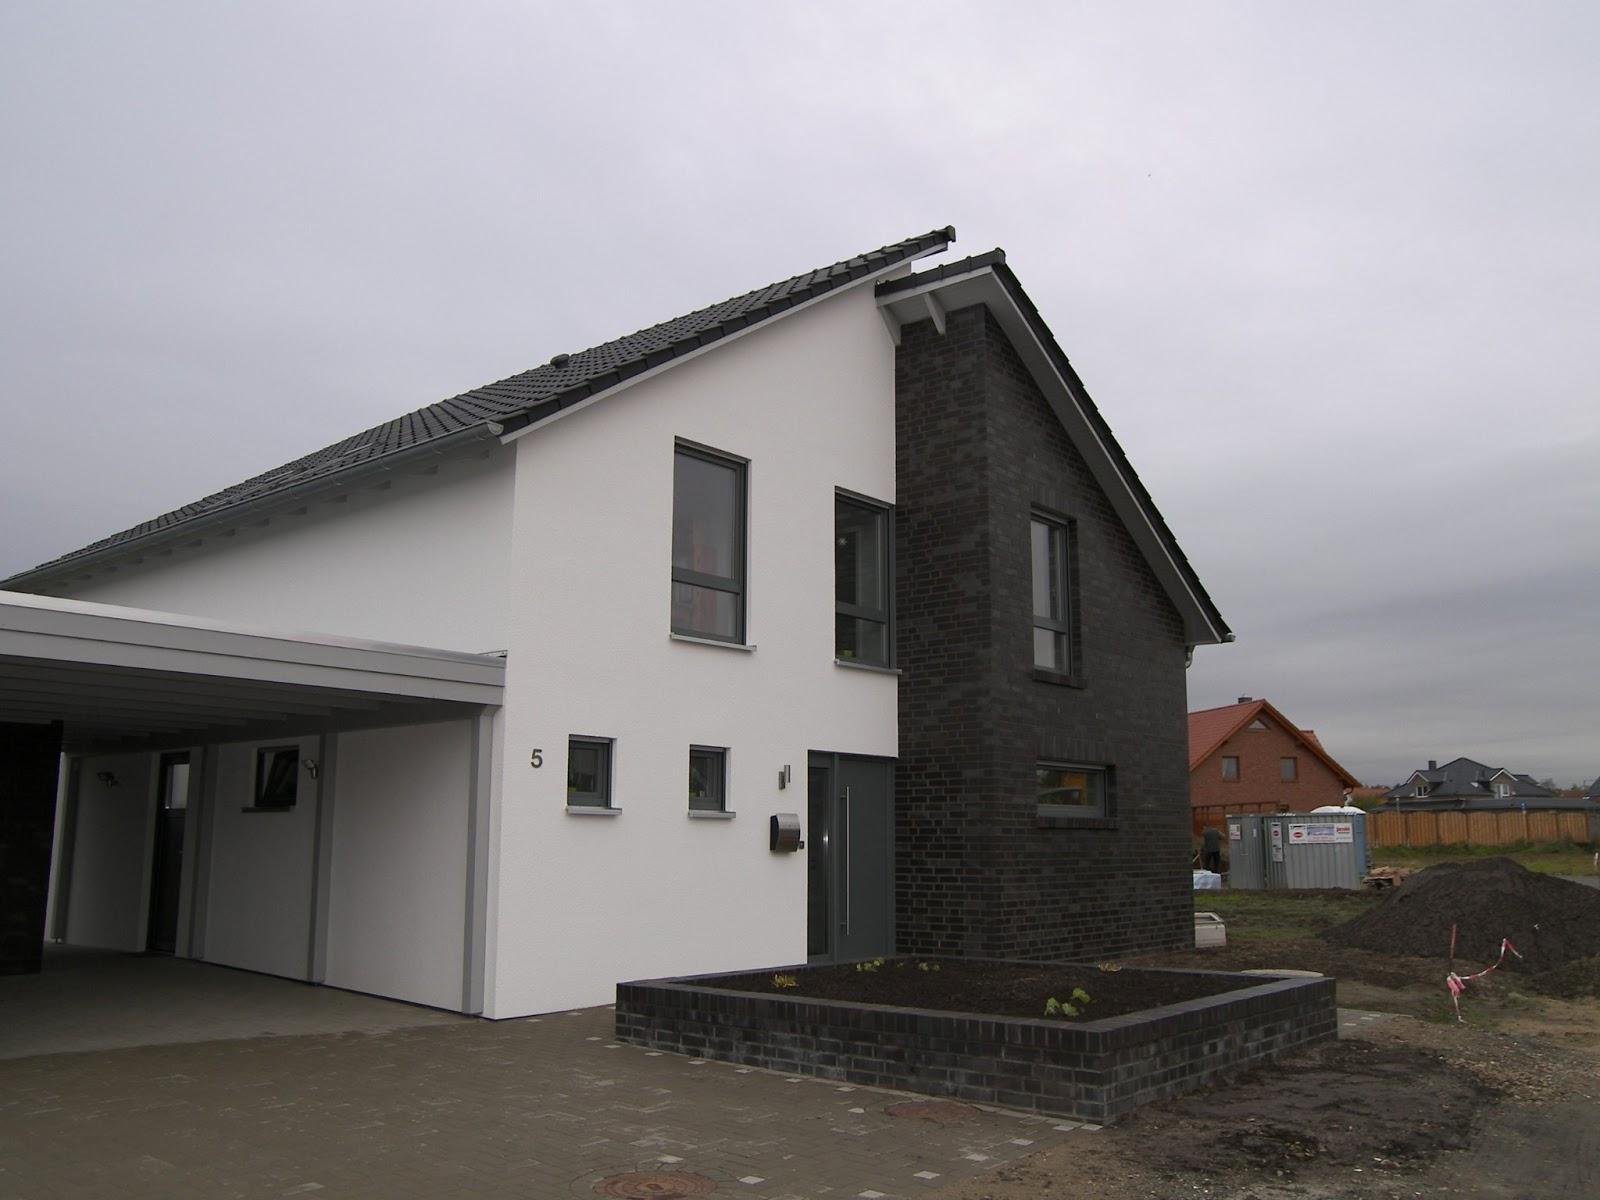 referenzen zielsdorf pultdach. Black Bedroom Furniture Sets. Home Design Ideas